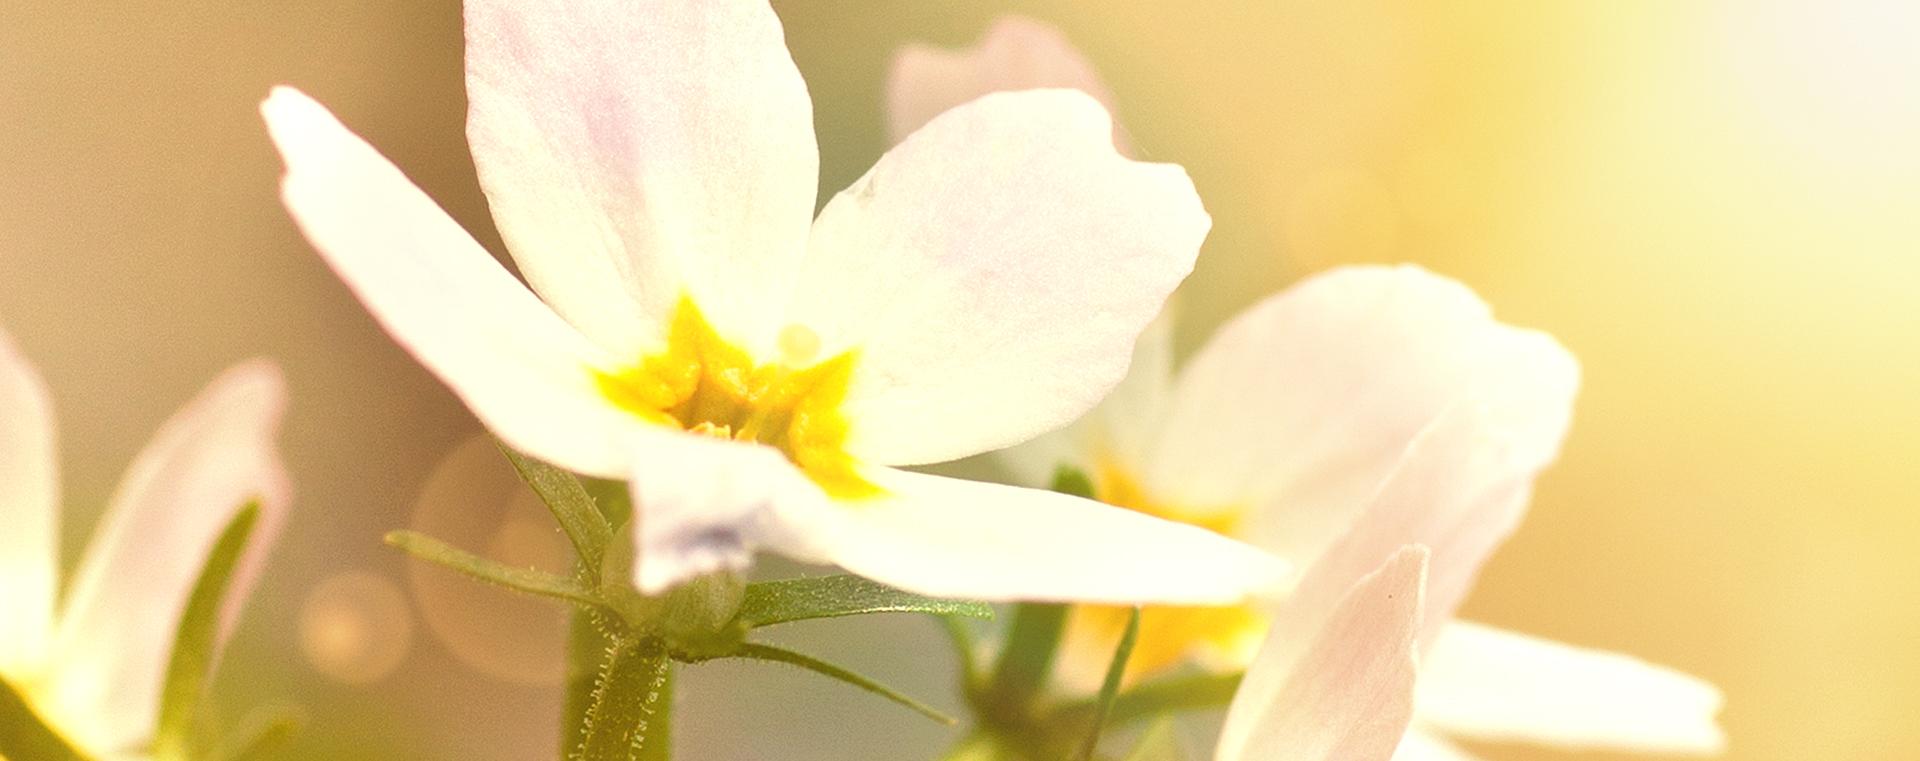 Nr 34 Water Violet Sumpfwasserfeder Einsamkeit Lemon Pharma Original Bachblüten Dr. Bach